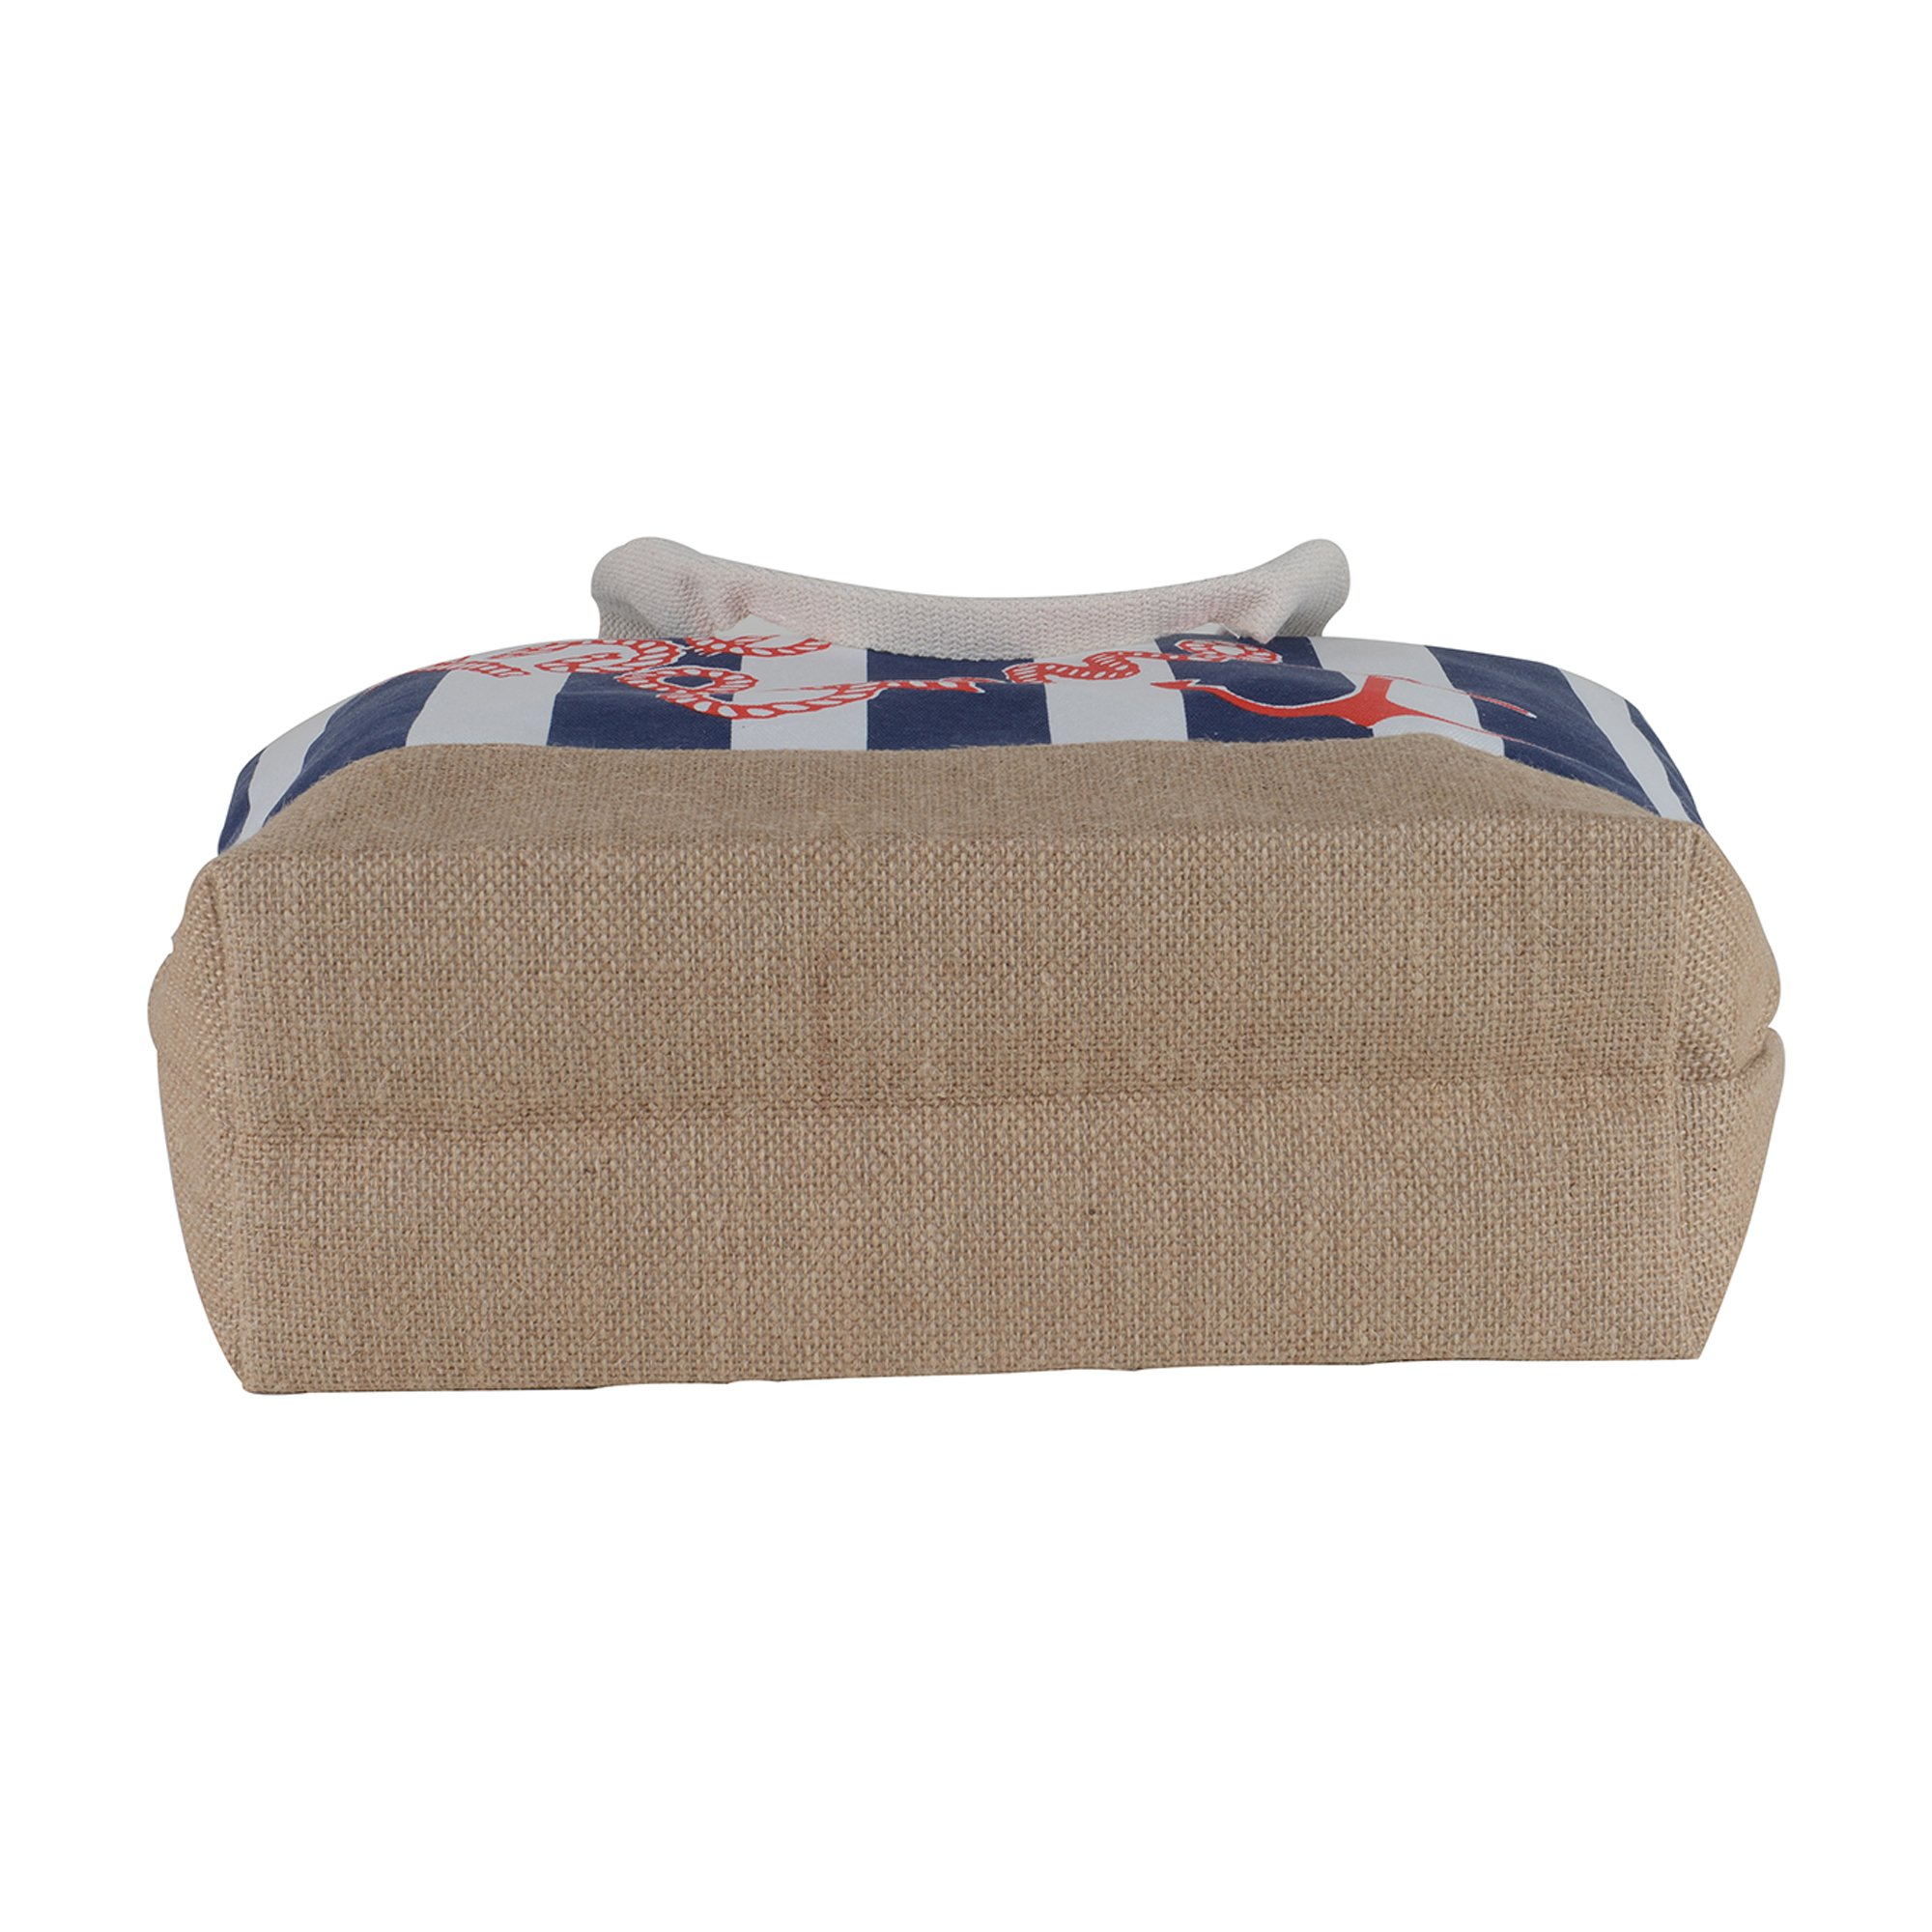 Canvas Burlap Beach & Me Printed Cotton Heavy Shoulder Straps Premium Women Tote Bag by BB (Navy Blue) by BB (Image #5)